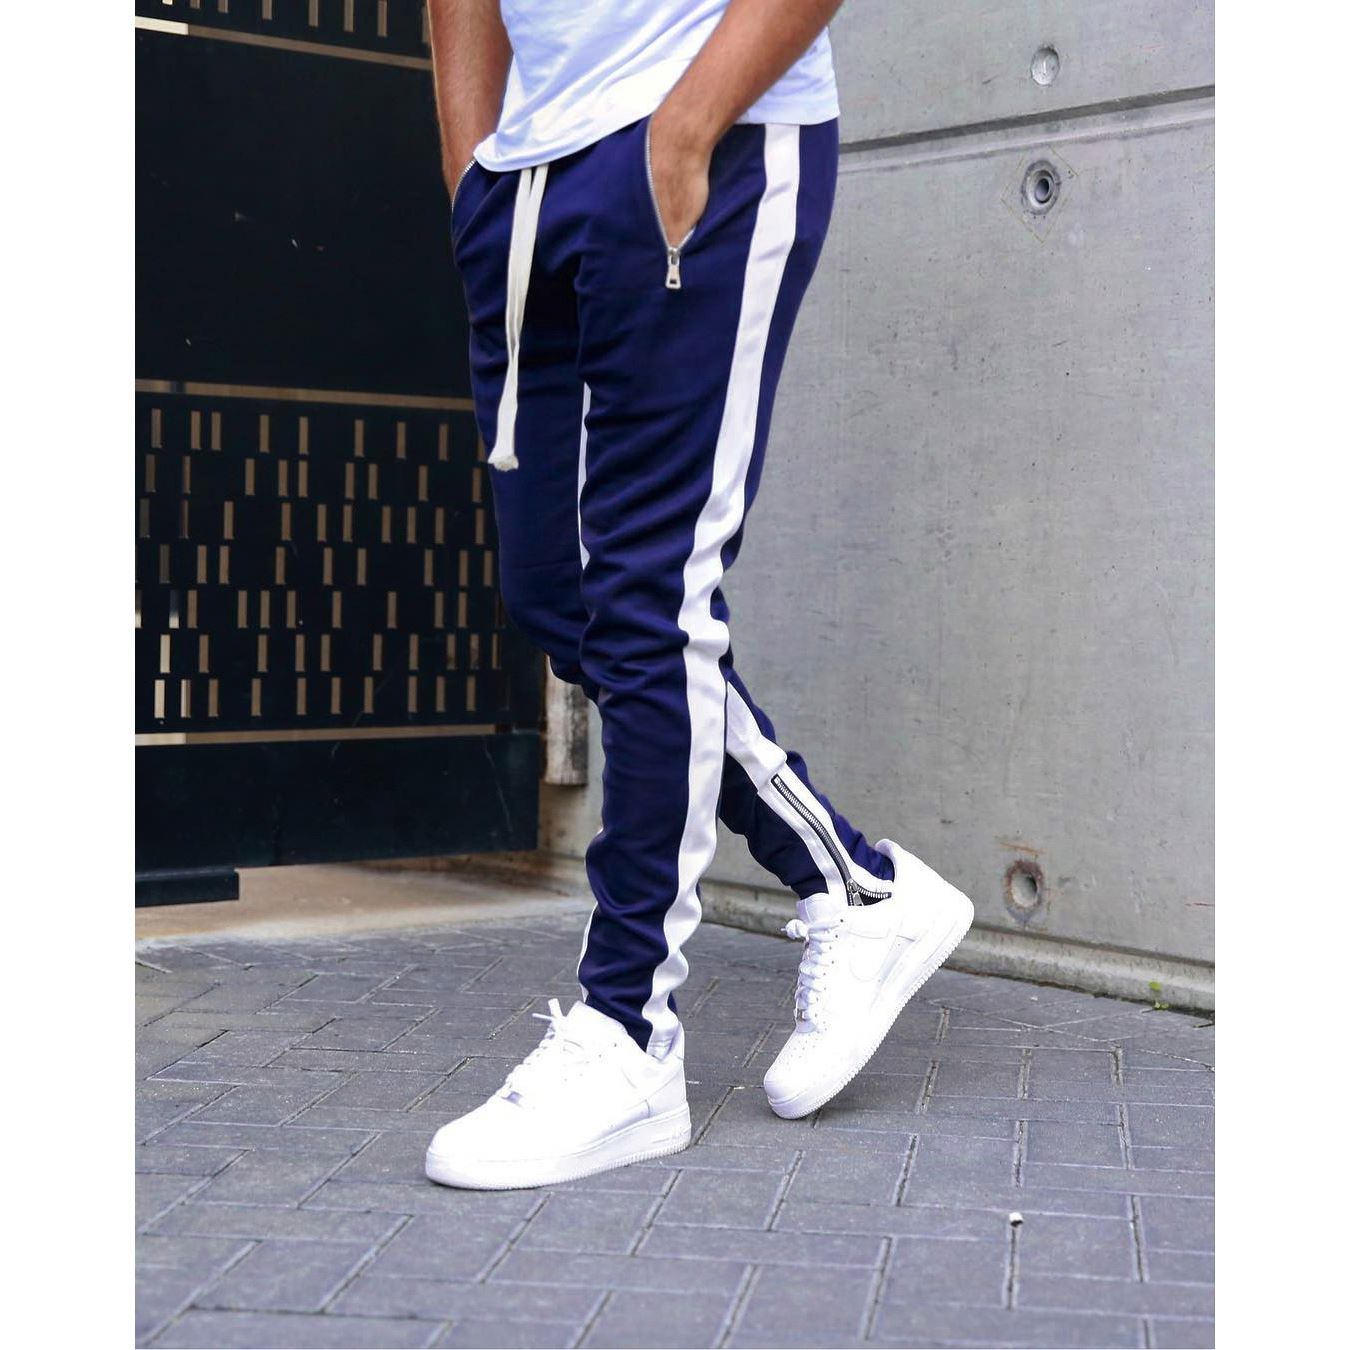 Pantalones Jogger De Moda Para Hombre Pantalones De Sudor De Fear Of God Para Hombre Buy Fear Of God Pantalones De Correr De Moda Pantalones Deportivos Con Rayas Laterales Product On Alibaba Com